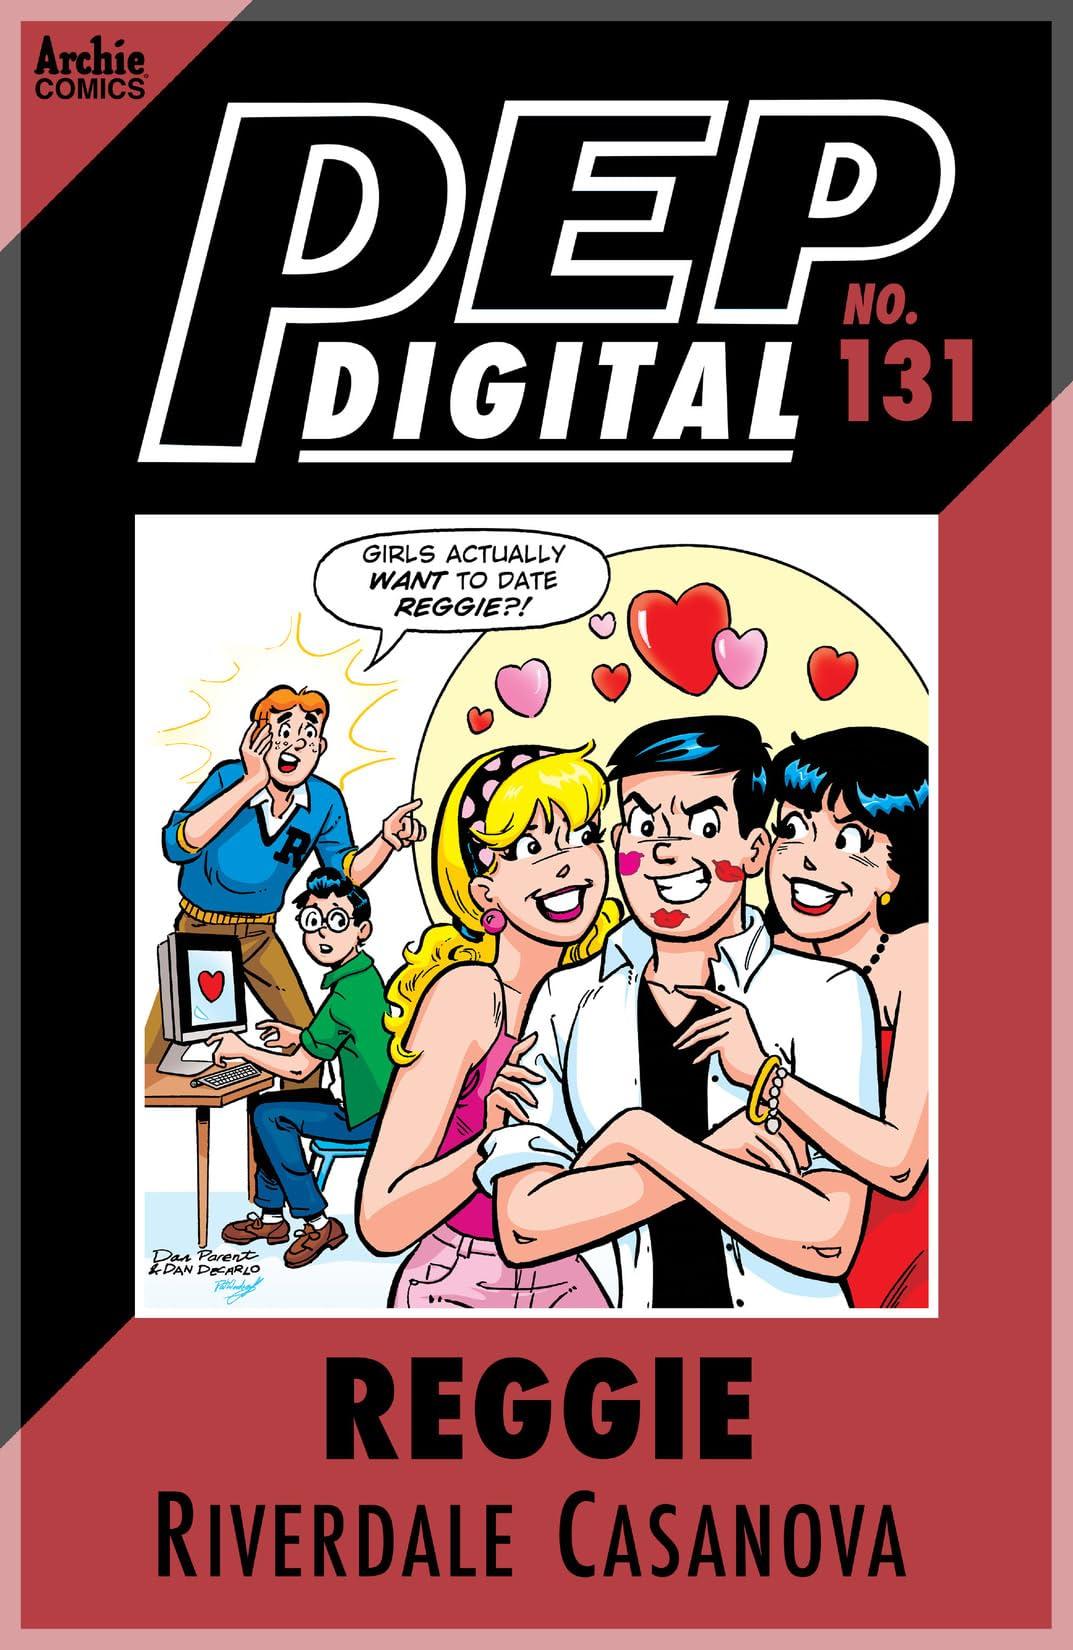 PEP Digital #131: Reggie Riverdale Casanova